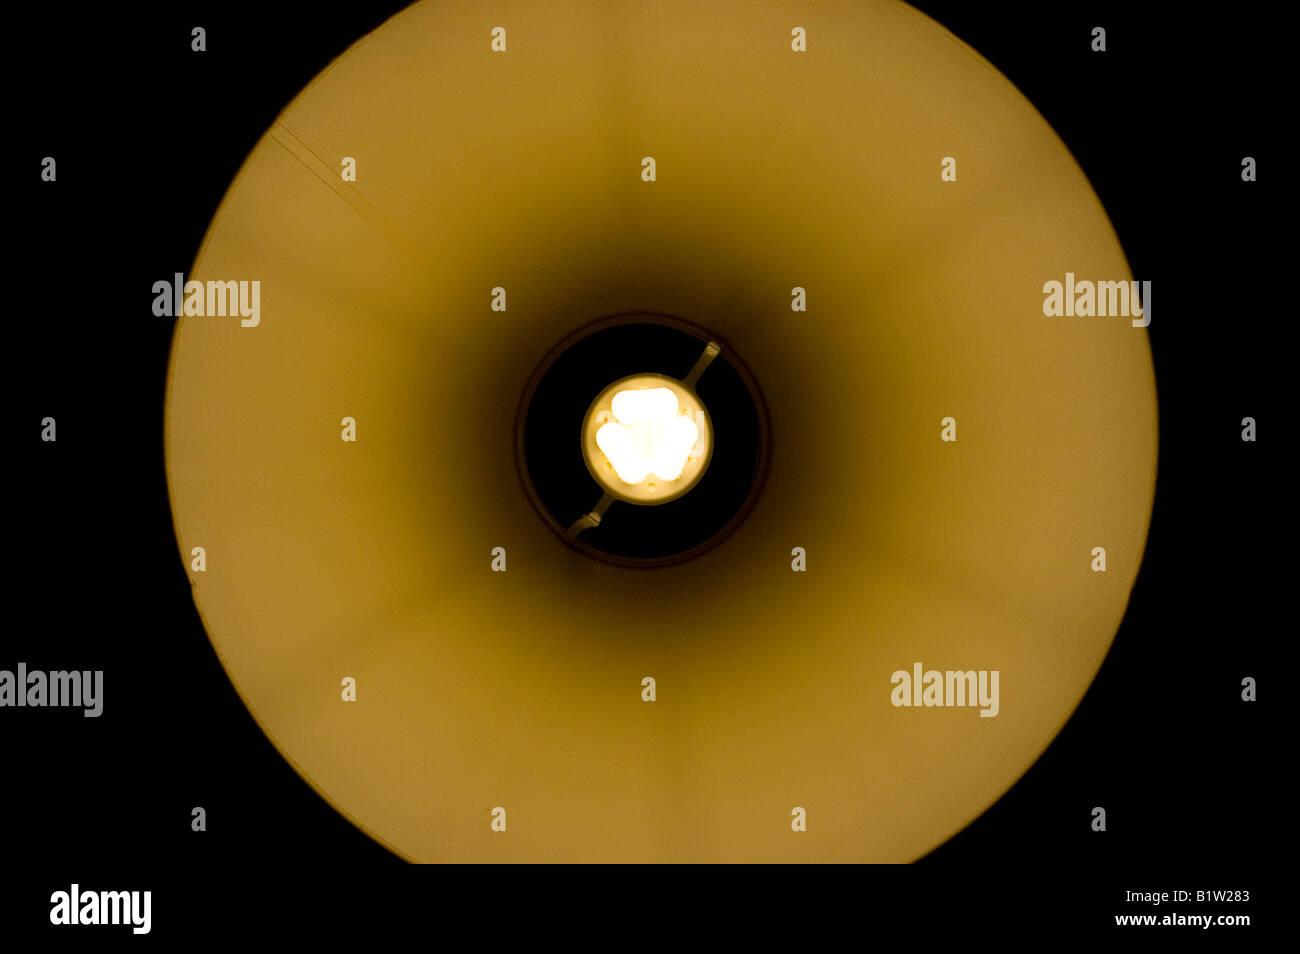 Circular lamp shade stock photos circular lamp shade stock images energy saving bulb with circular lamp shade stock image aloadofball Gallery